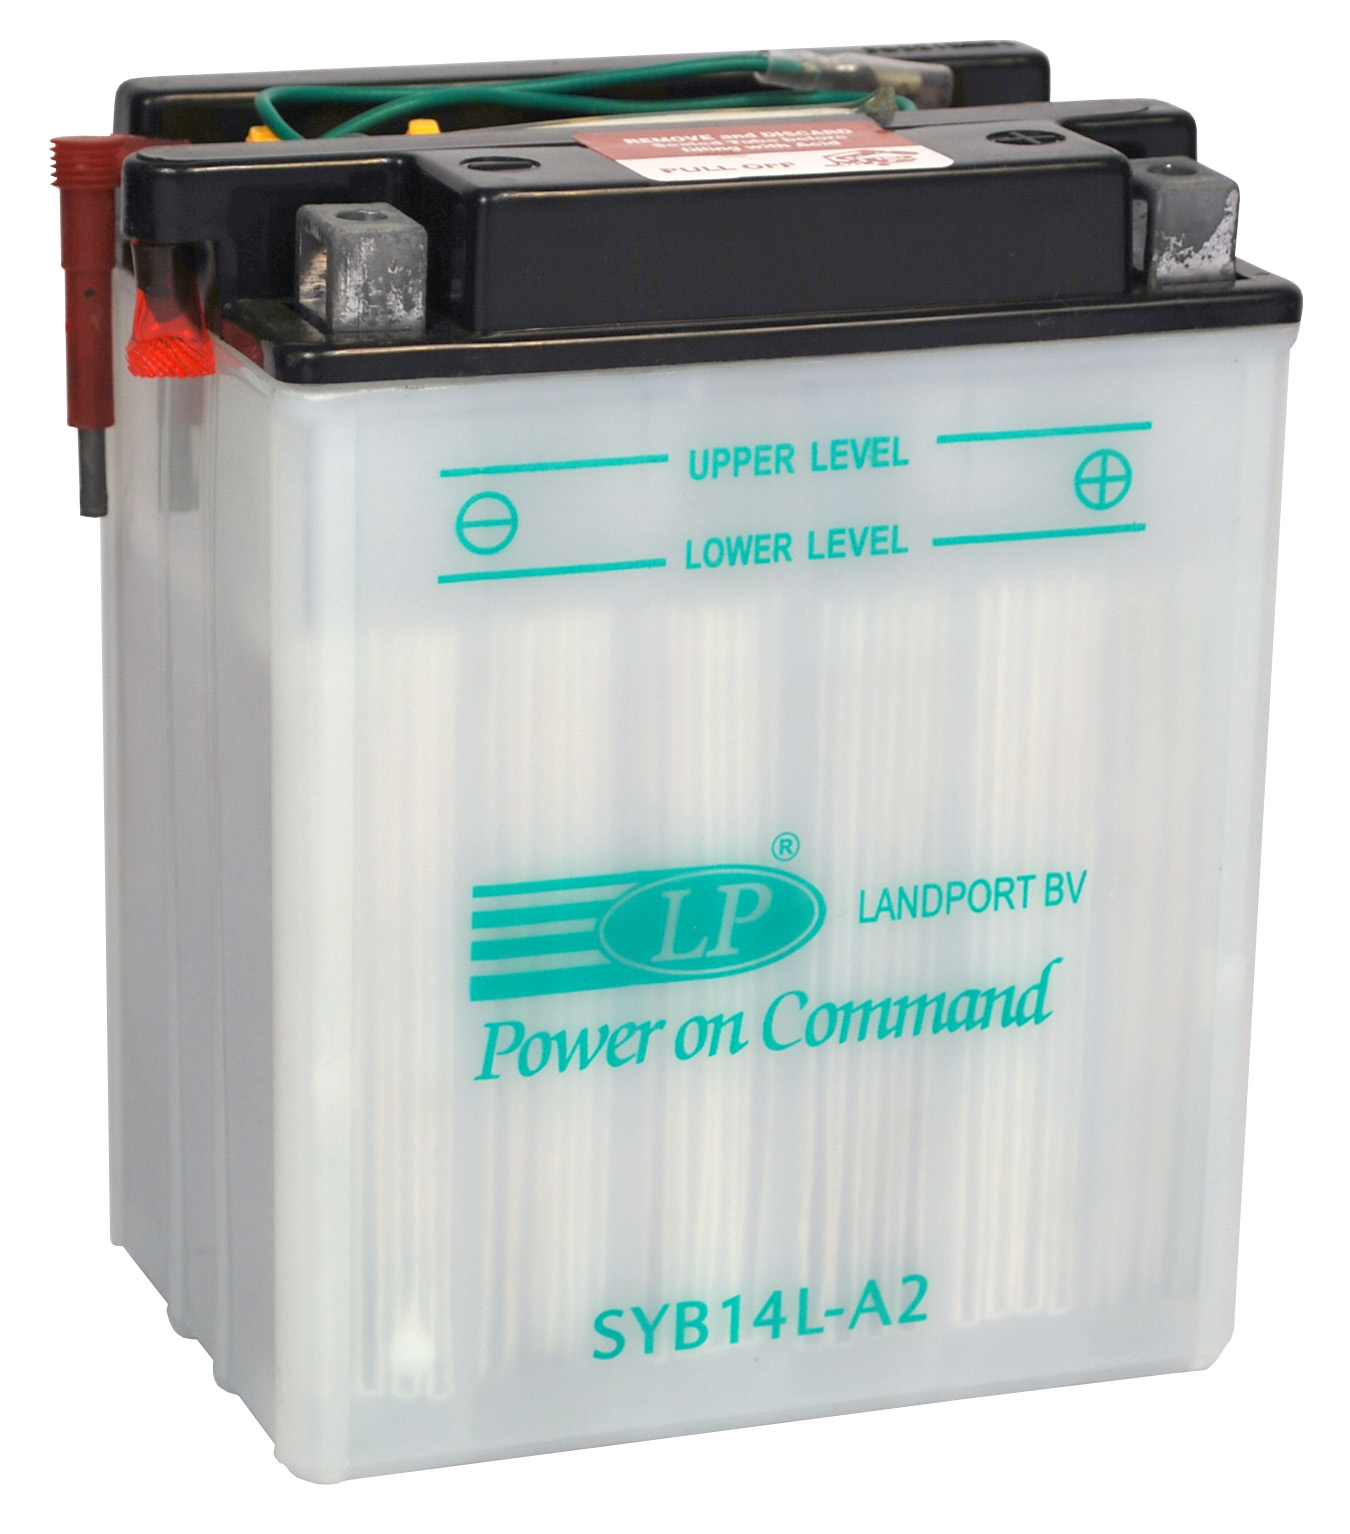 SYB14L-A2 motor accu zonder zuurpakket